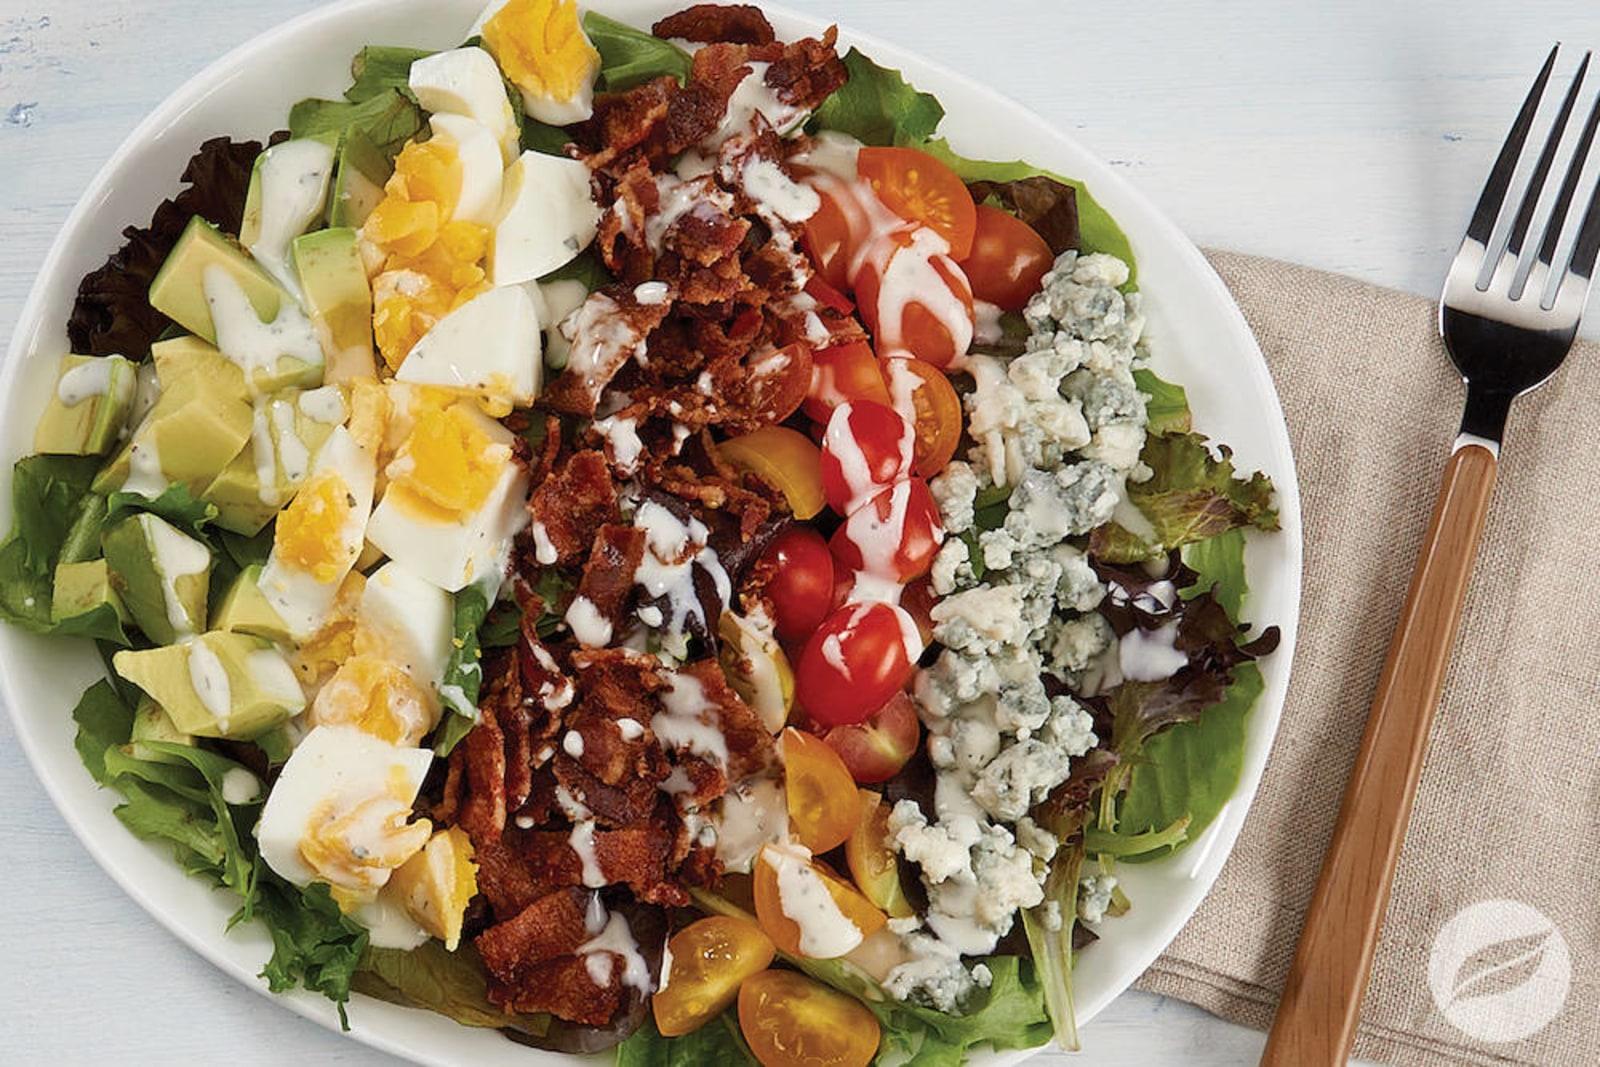 Image of Cobb Salad